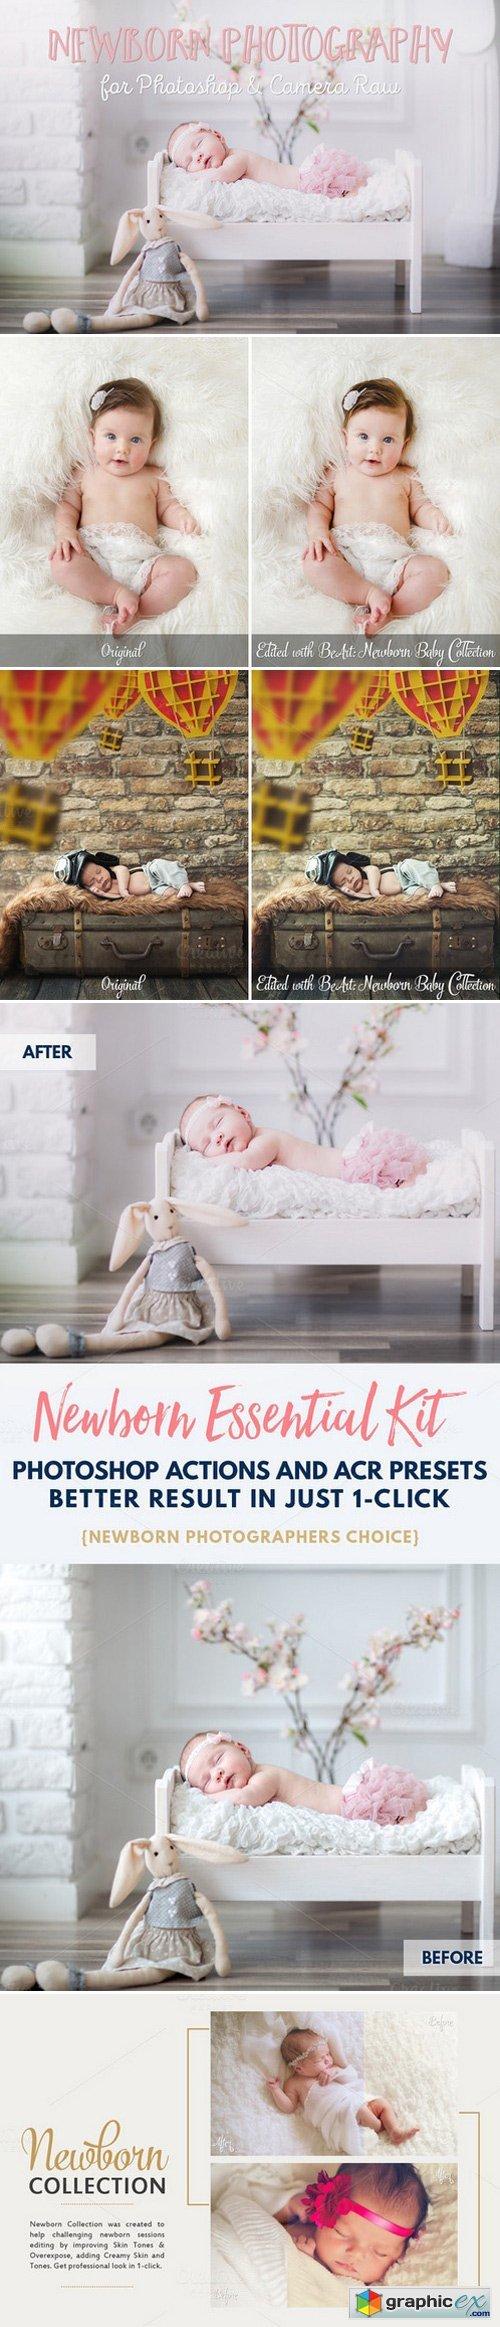 Essential newborn photoshop actions